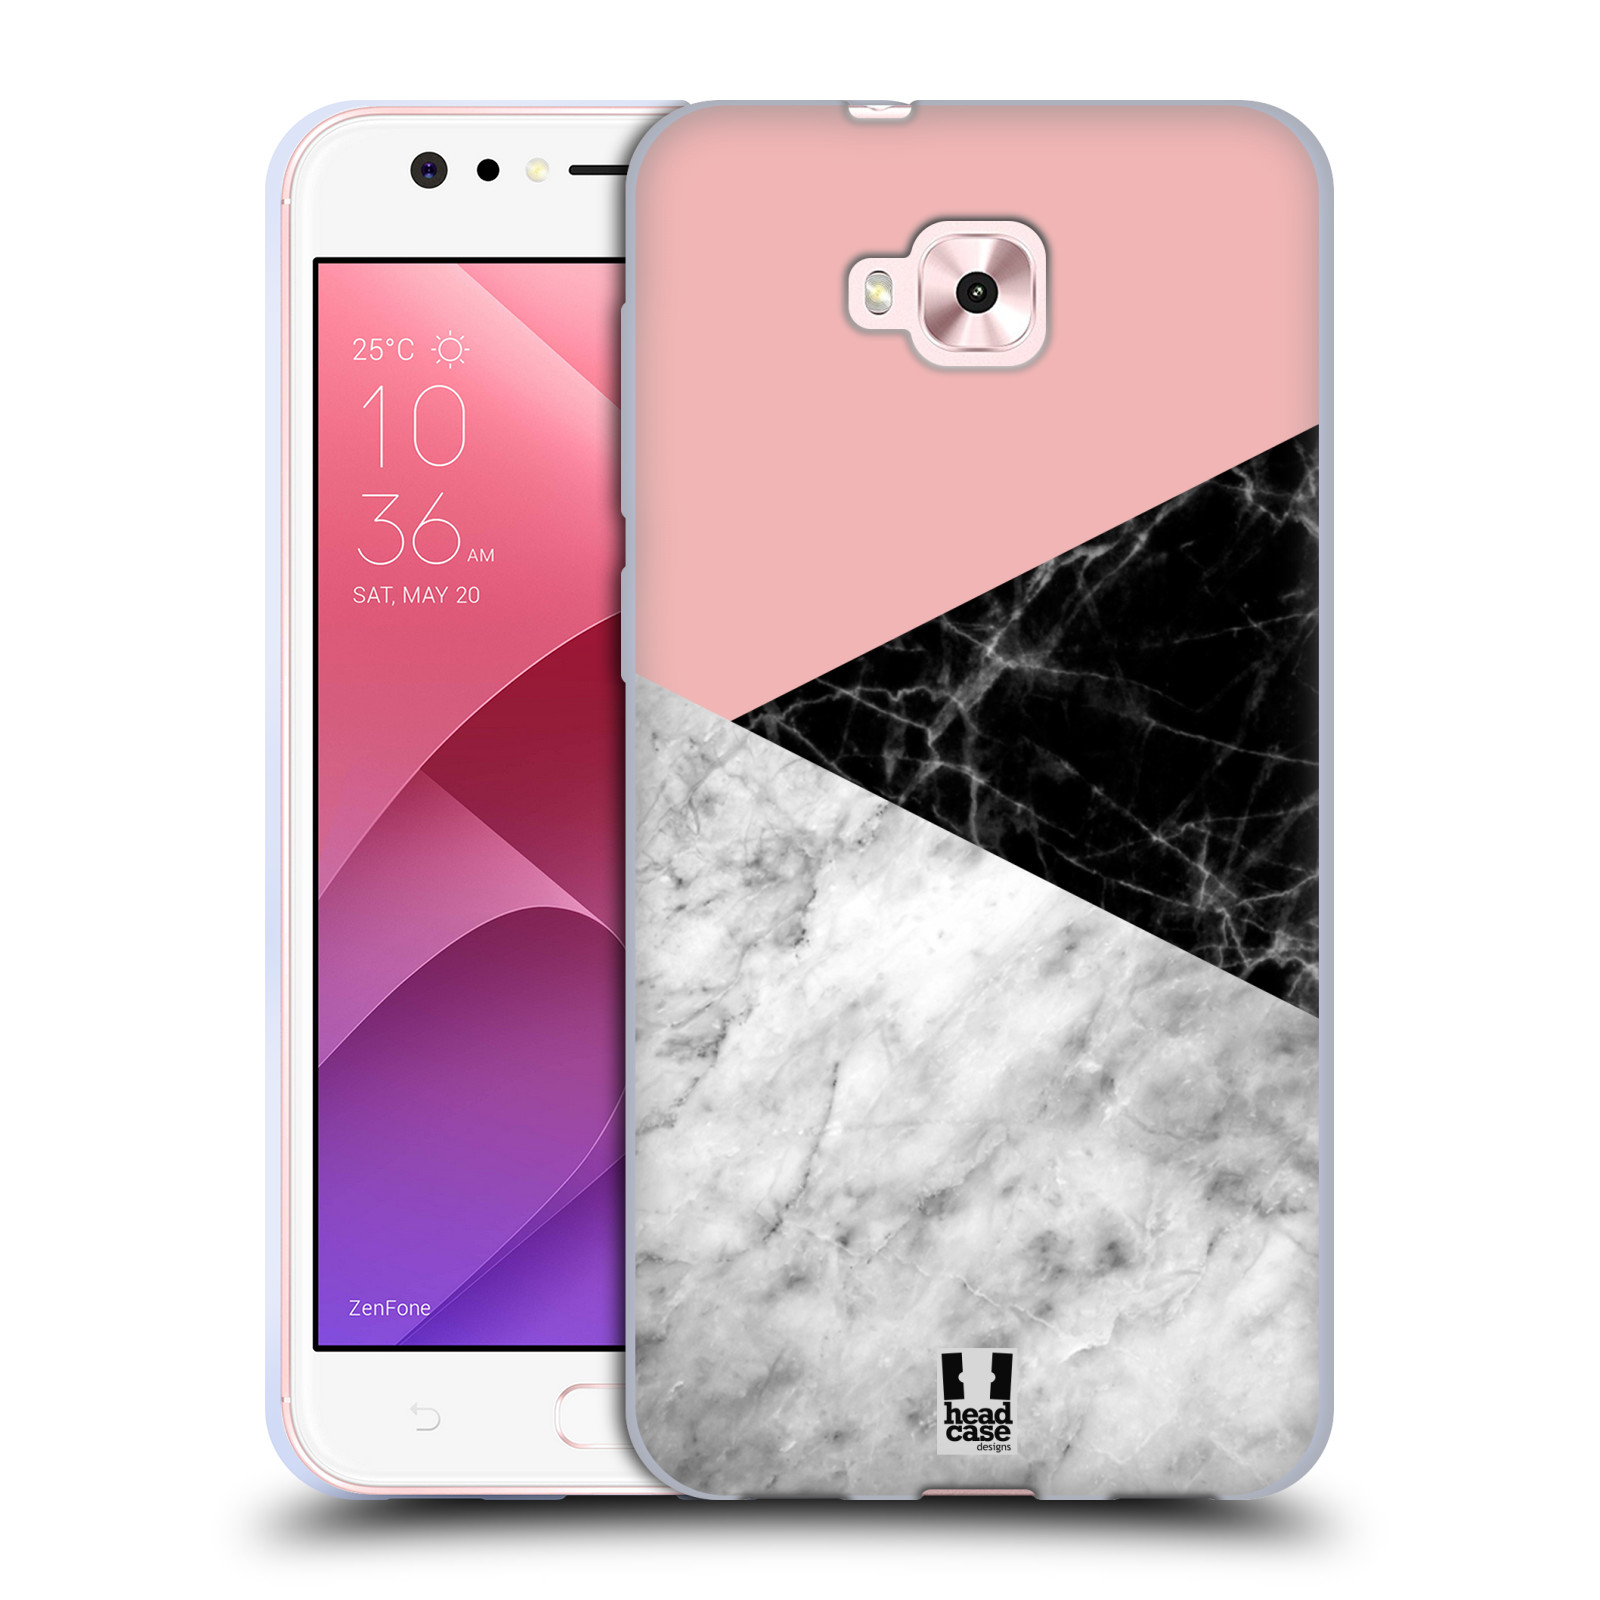 Silikonové pouzdro na mobil Asus Zenfone 4 Selfie ZD553KL - Head Case - Mramor mix